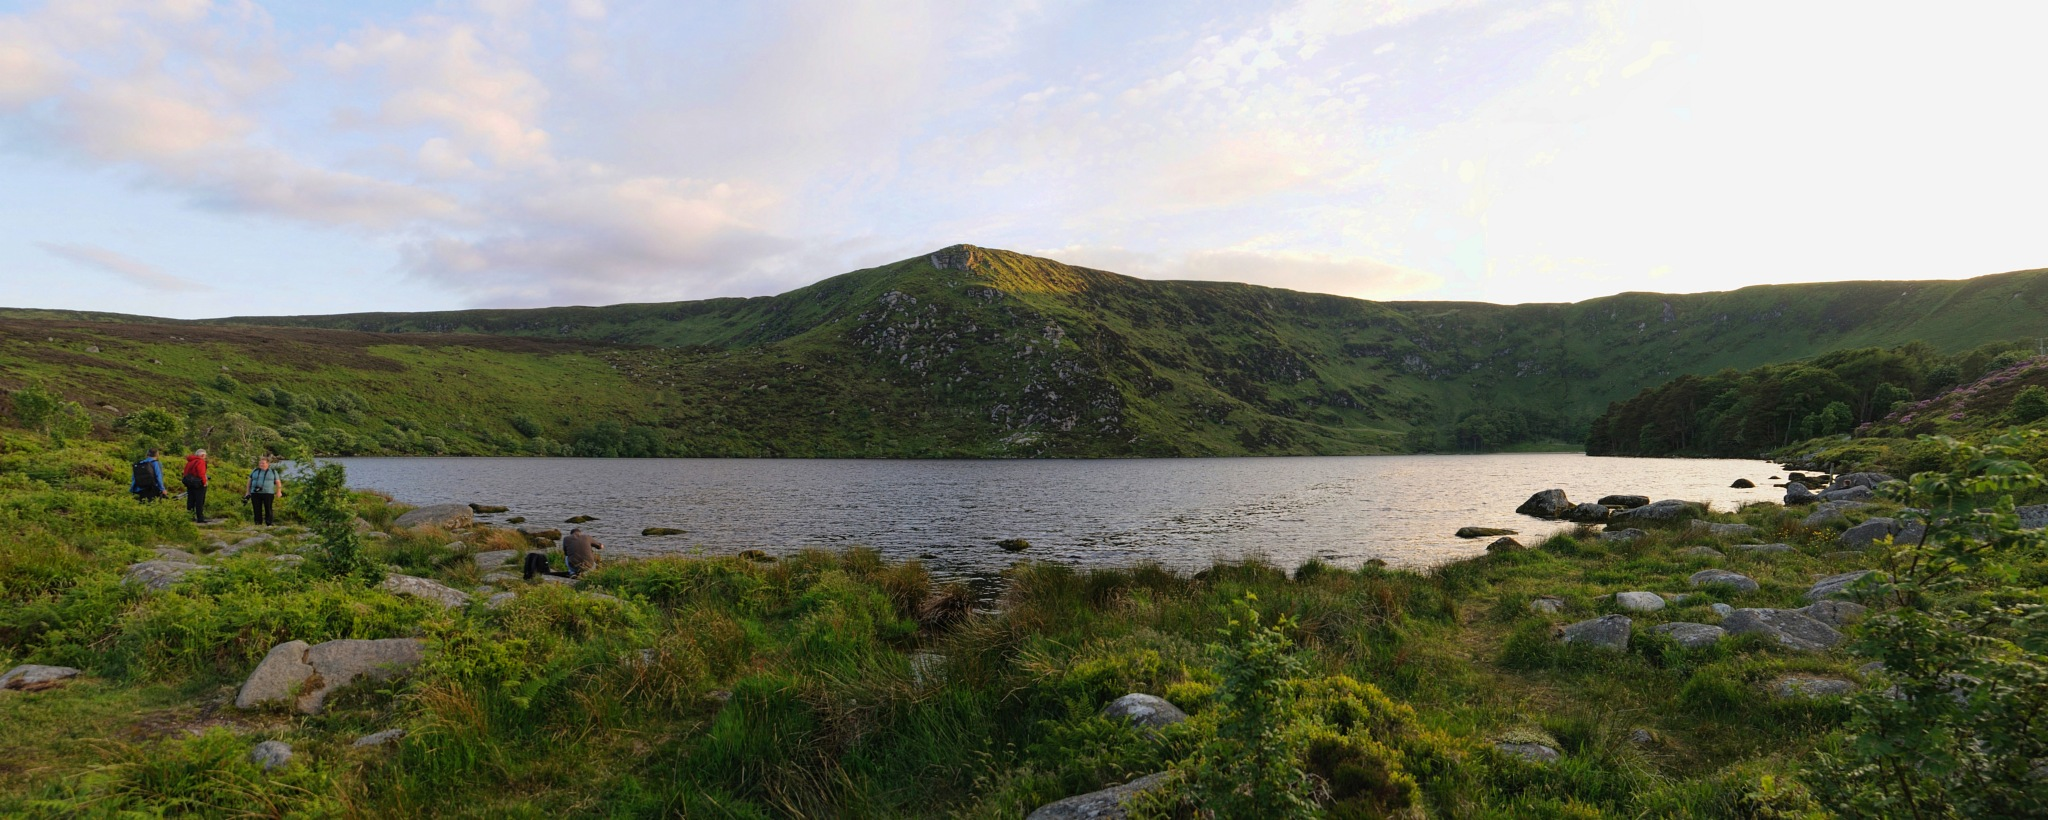 Panorama (59) - TPS Outing - Glencree (June 2013) (10) by Derek Clarke